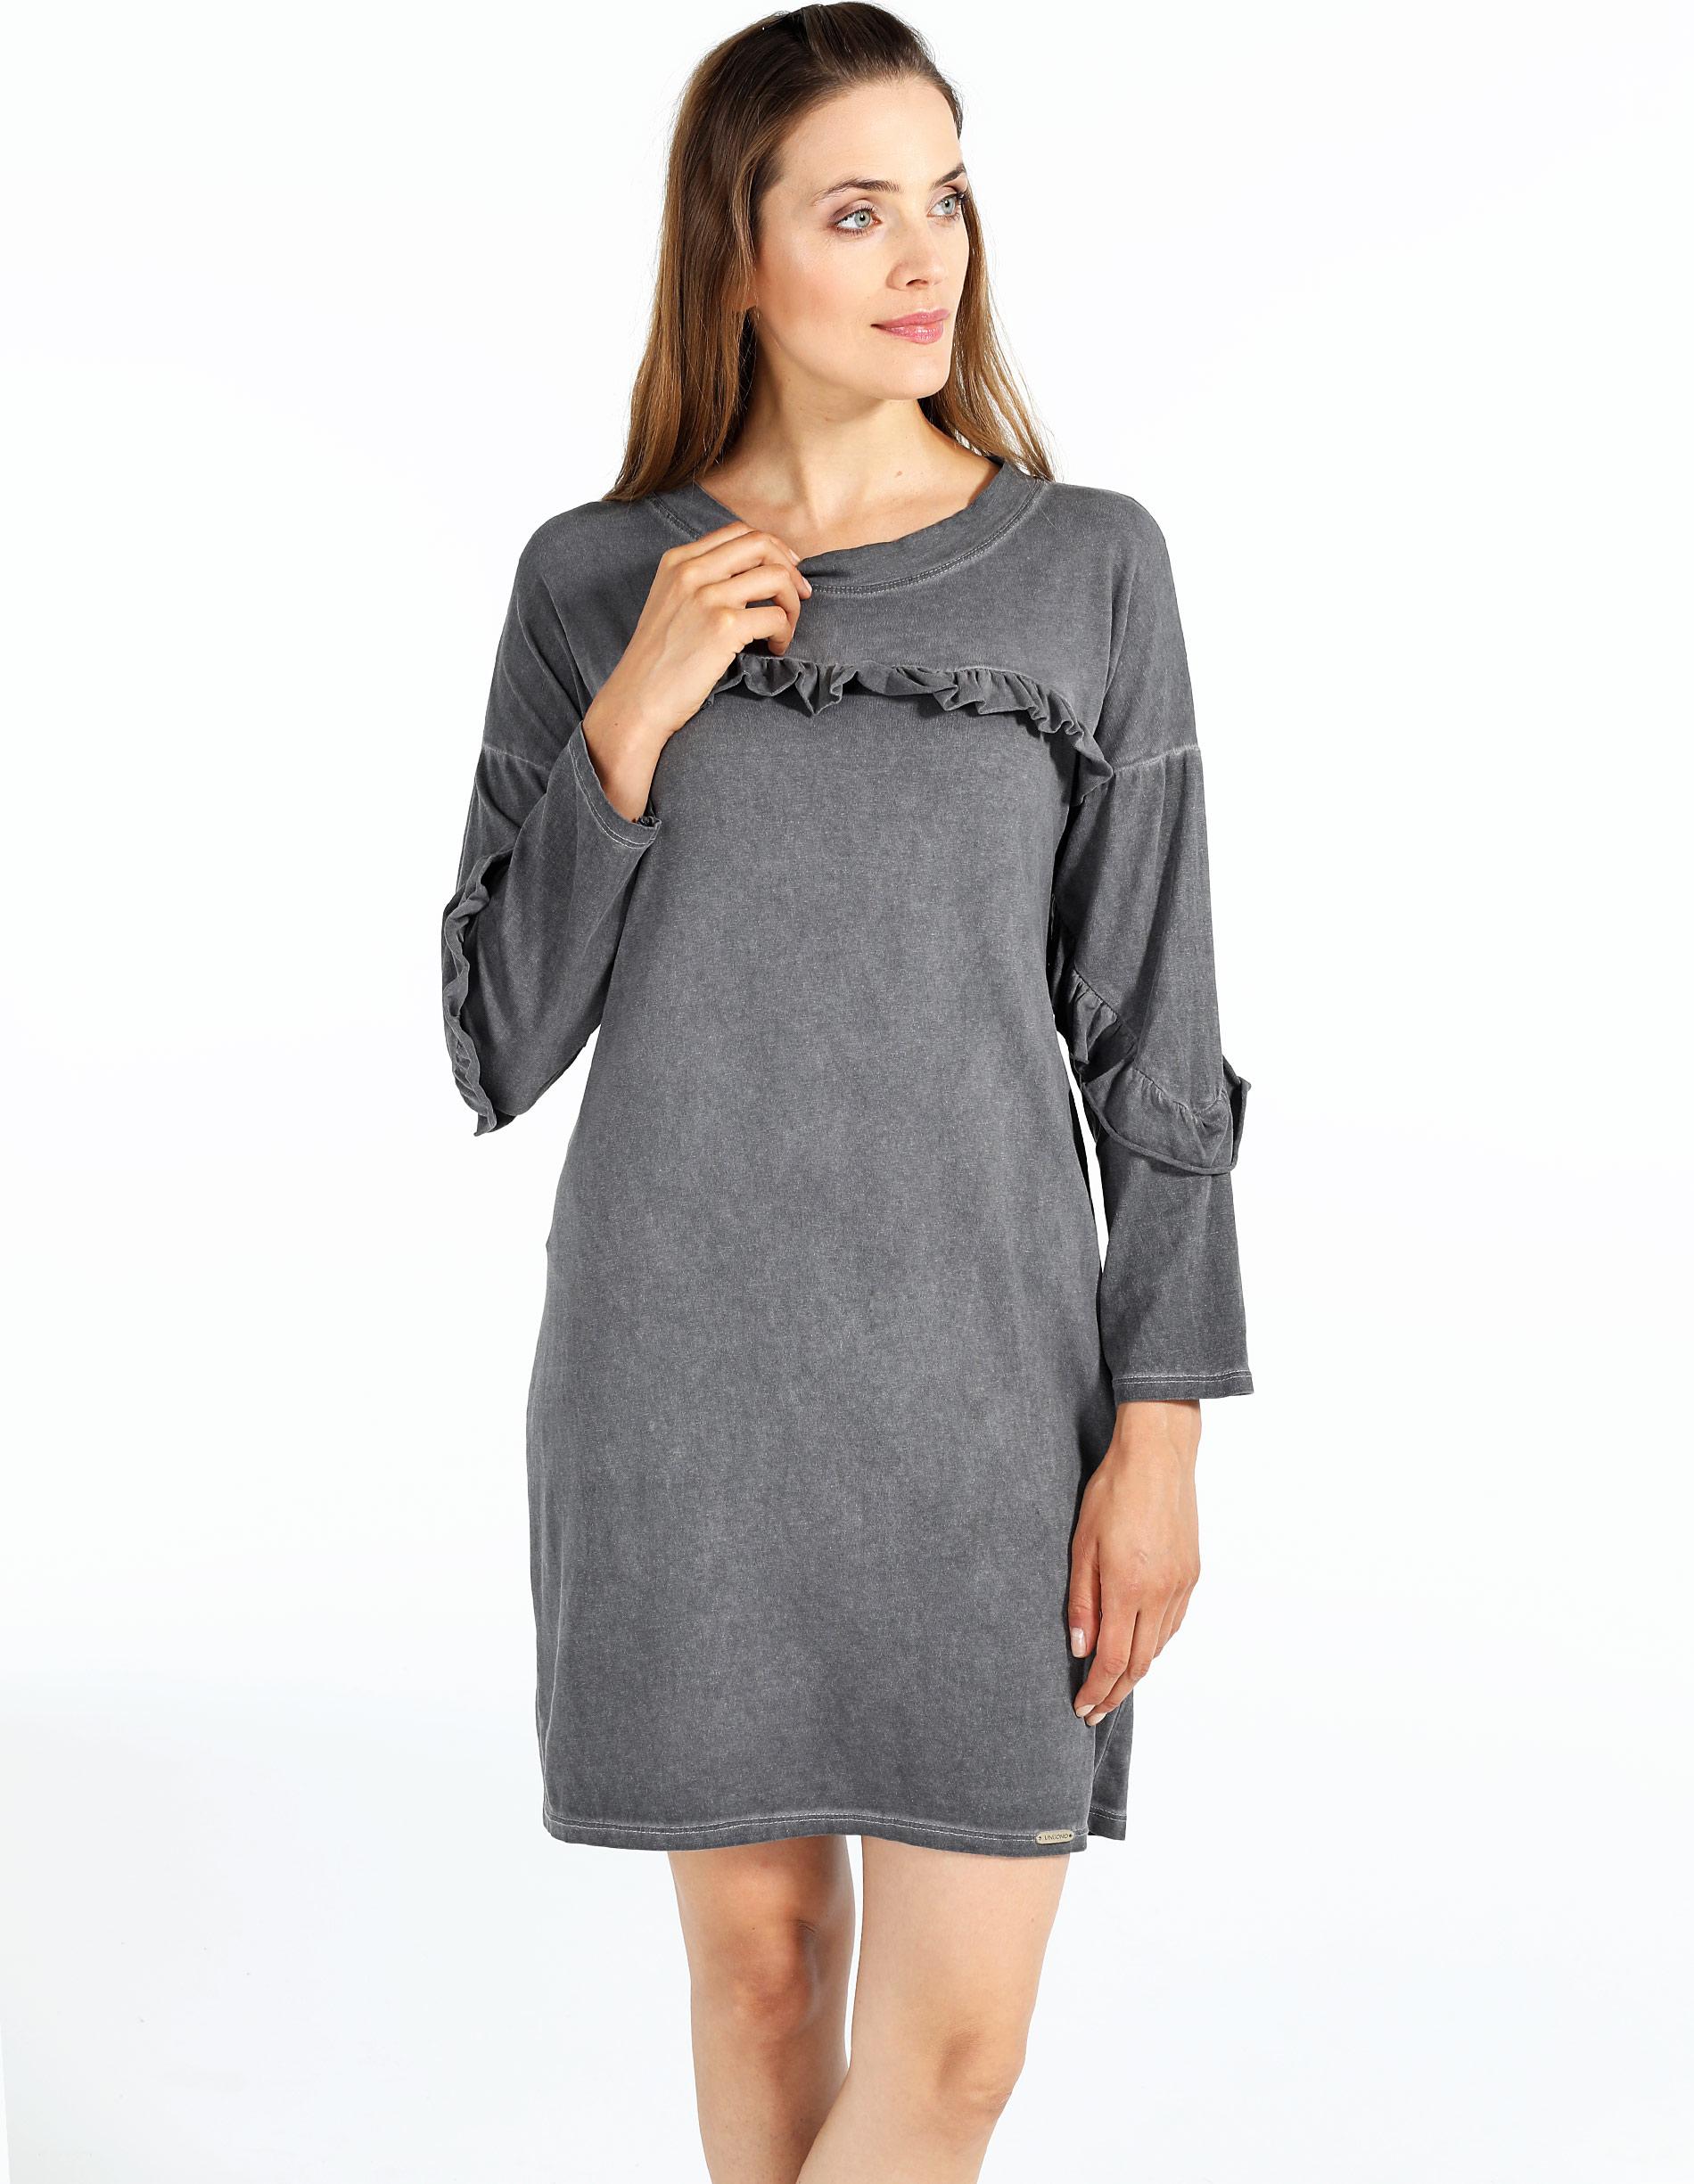 Sukienka - 34-I4008 PIOM - Unisono